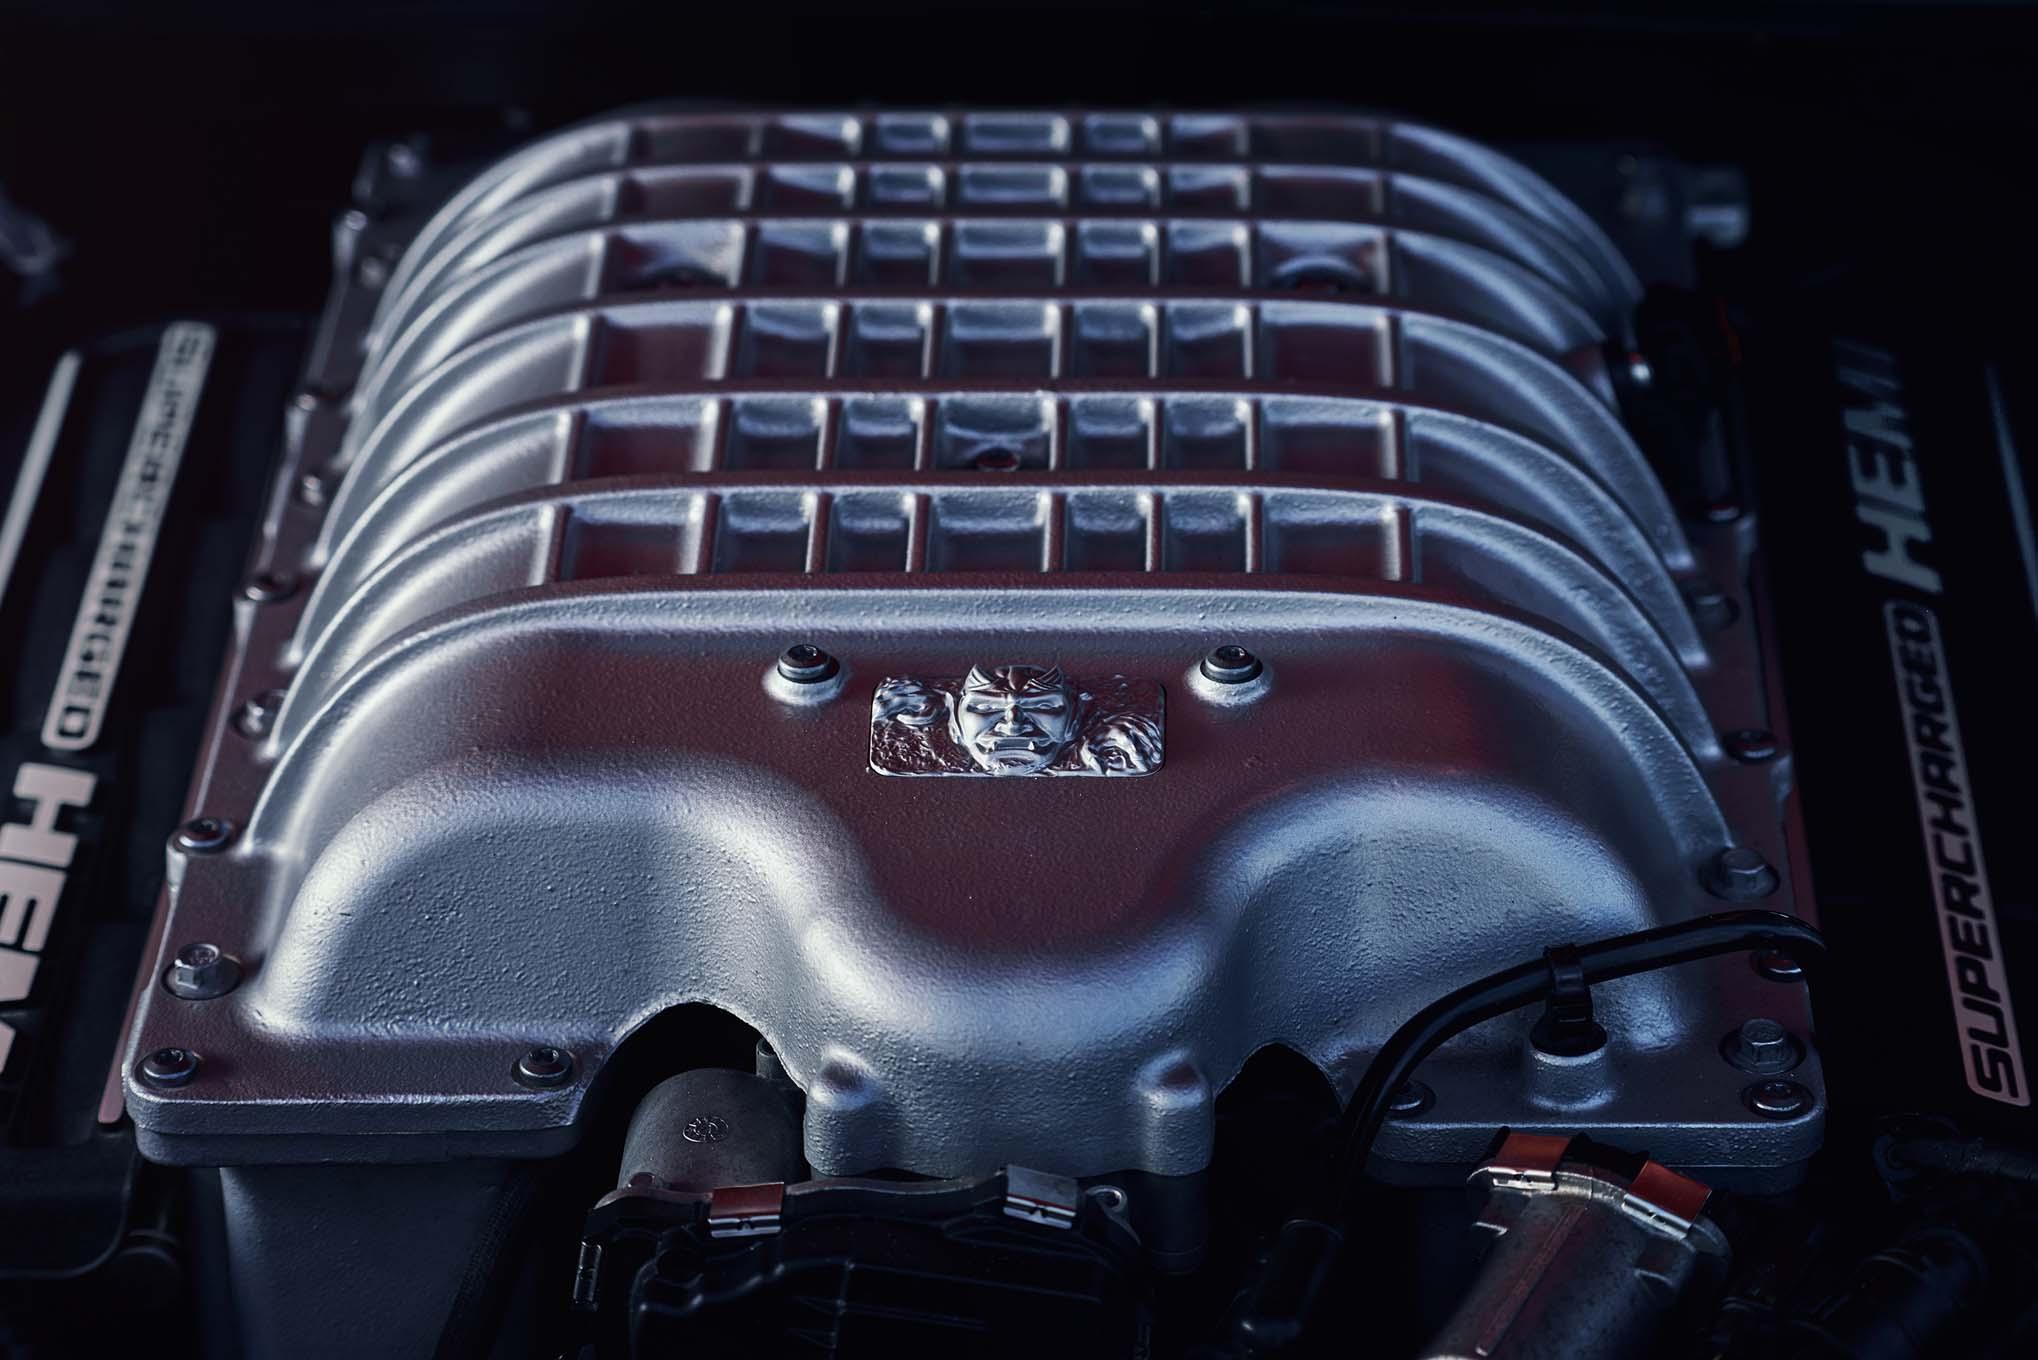 2018 Dodge Challenger Srt Demon Arrives With 840 Horsepower For The Sprinter Fuel Filters 62 155